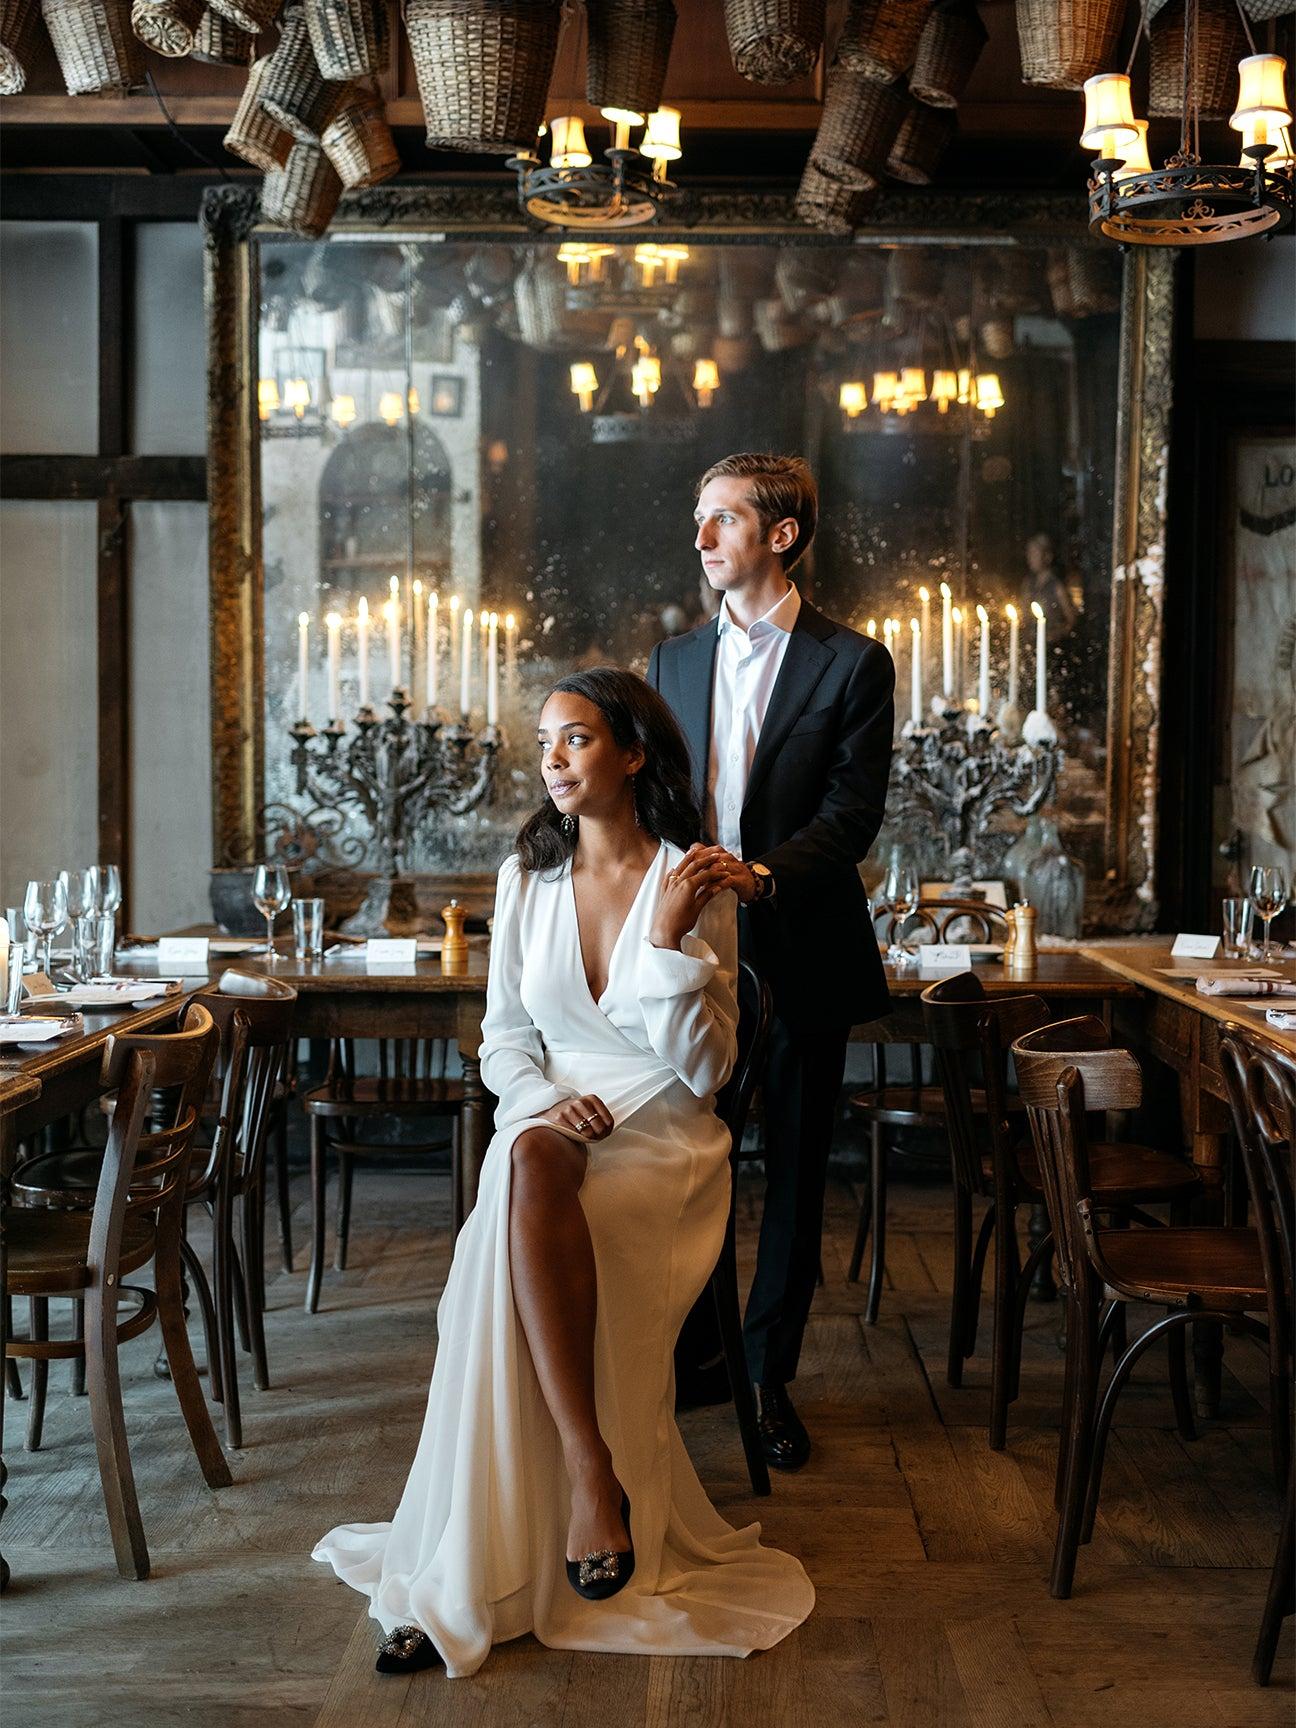 00-FEATURE-Sara-Urbaez-$7,500-Wedding